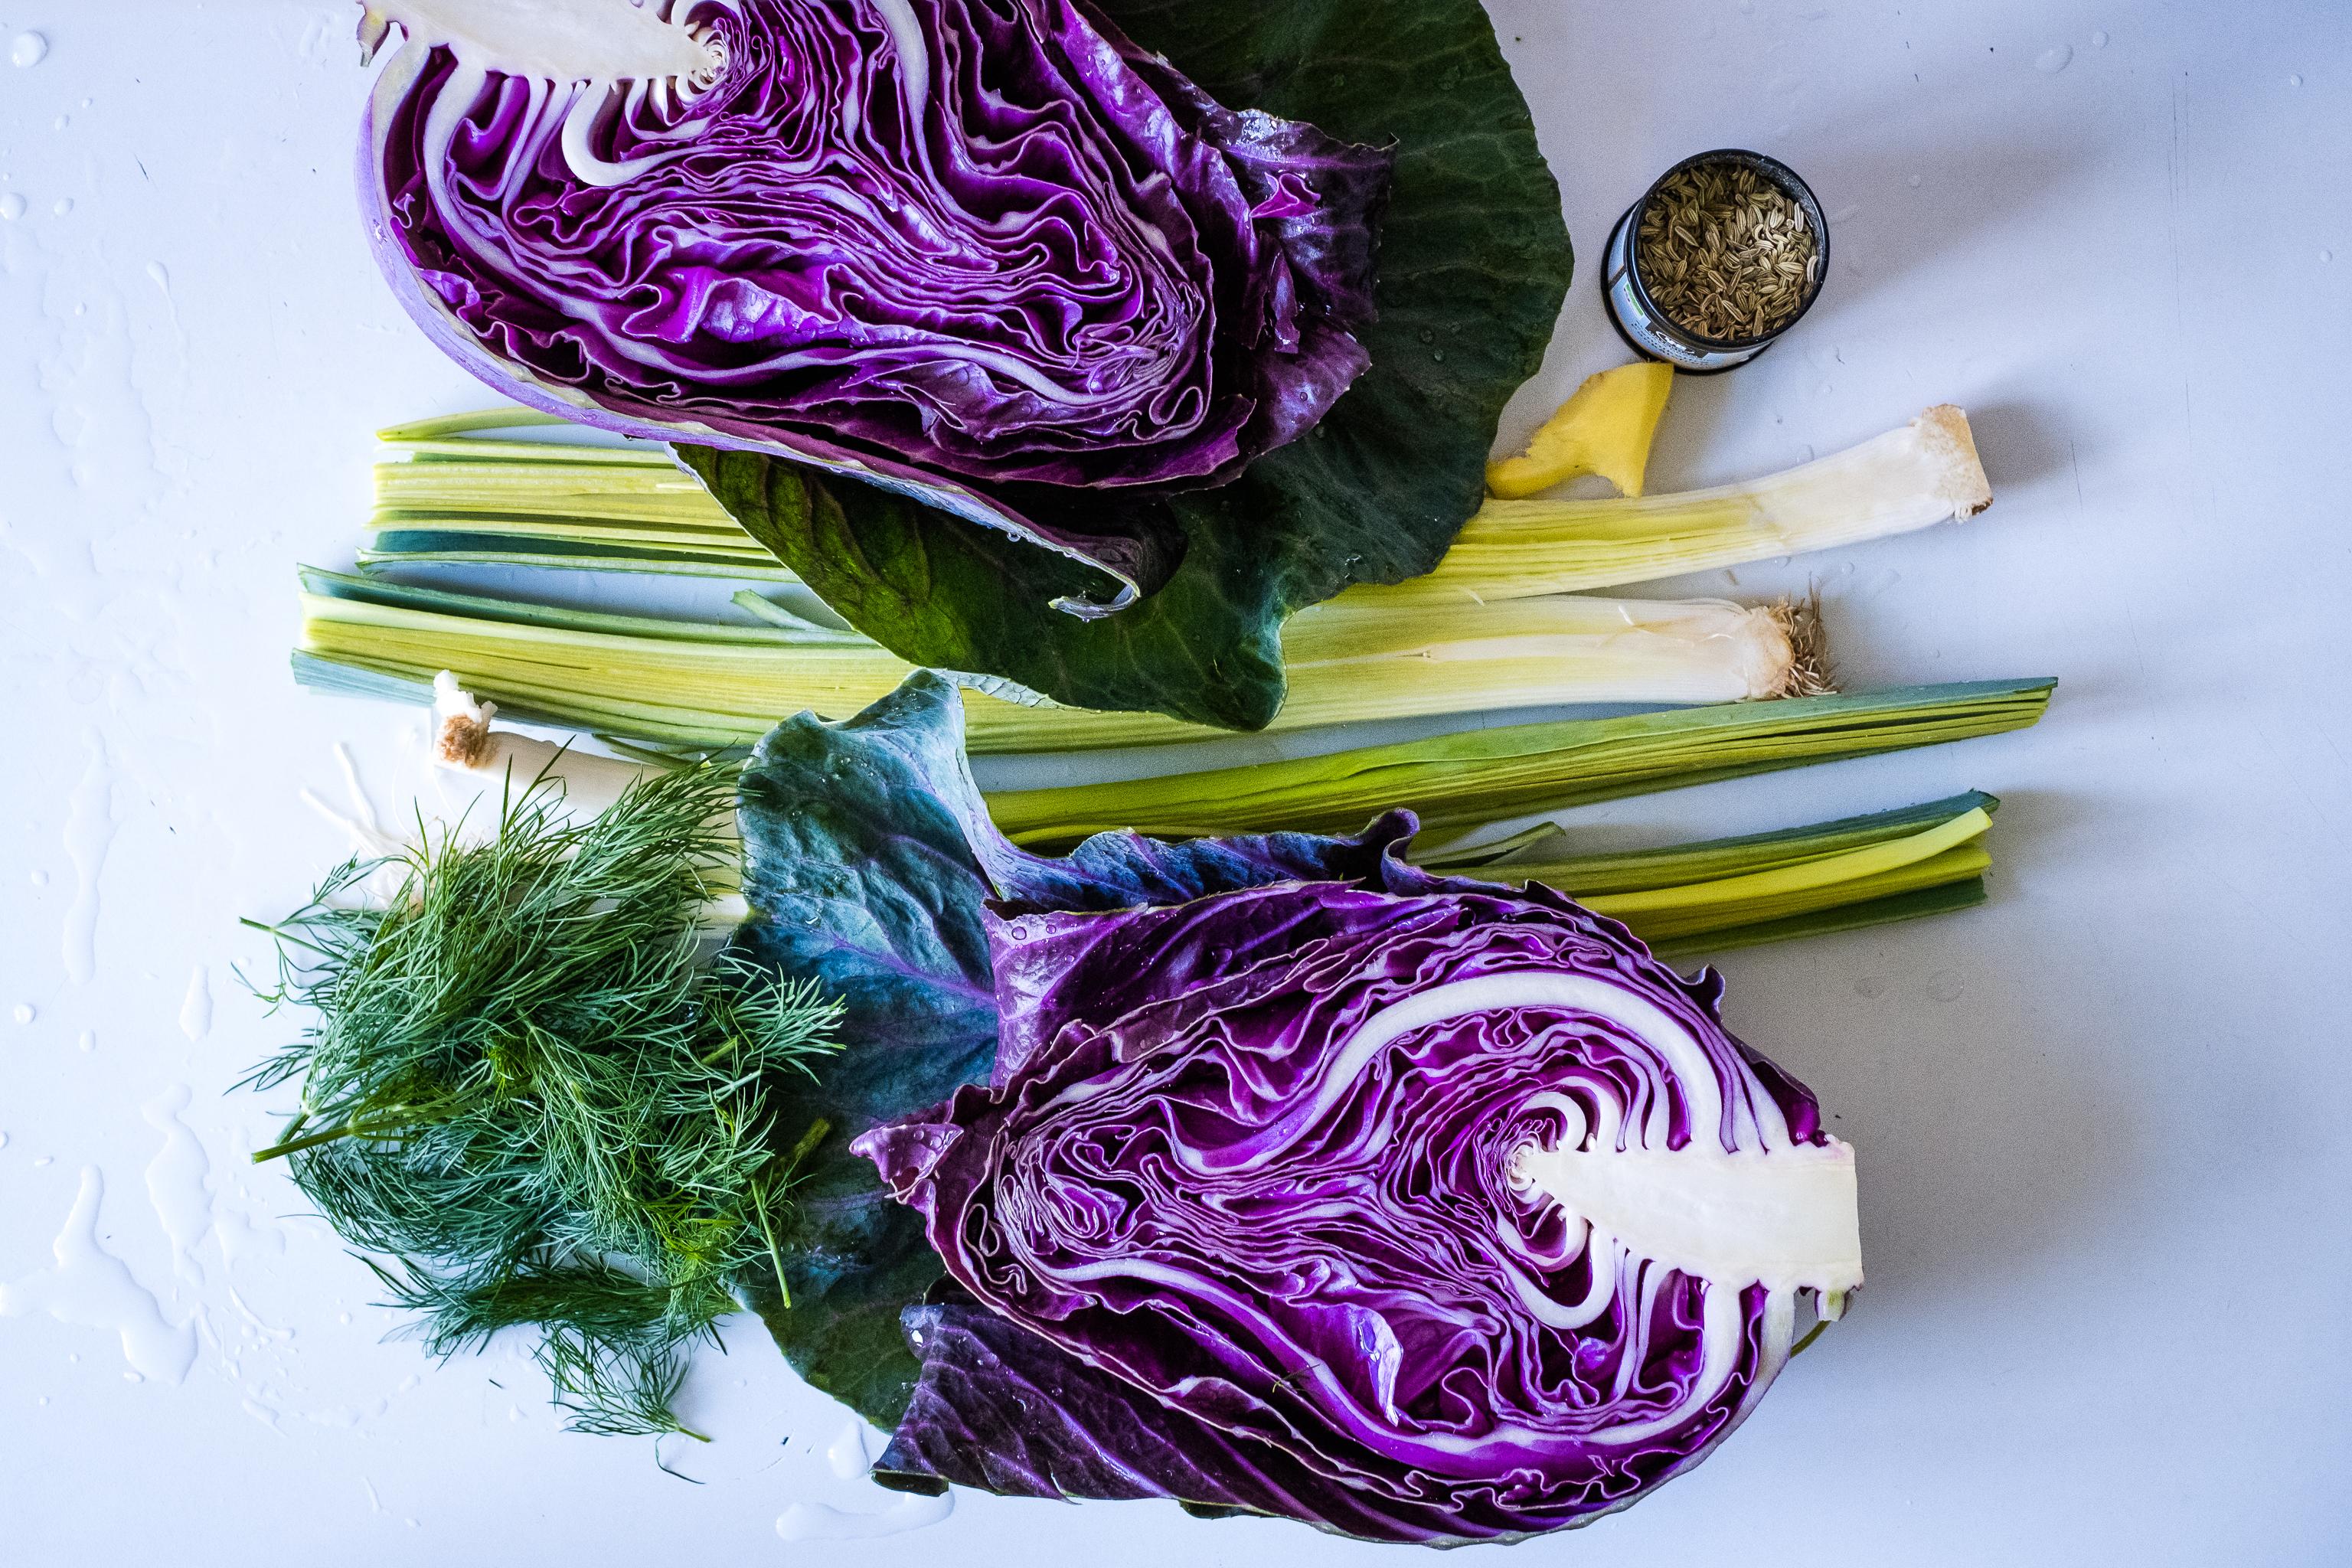 Just five ingredients: cabbage, leeks, dill, fennel seeds, ginger.  Plus extra virgin olive oil, salt and pepper.